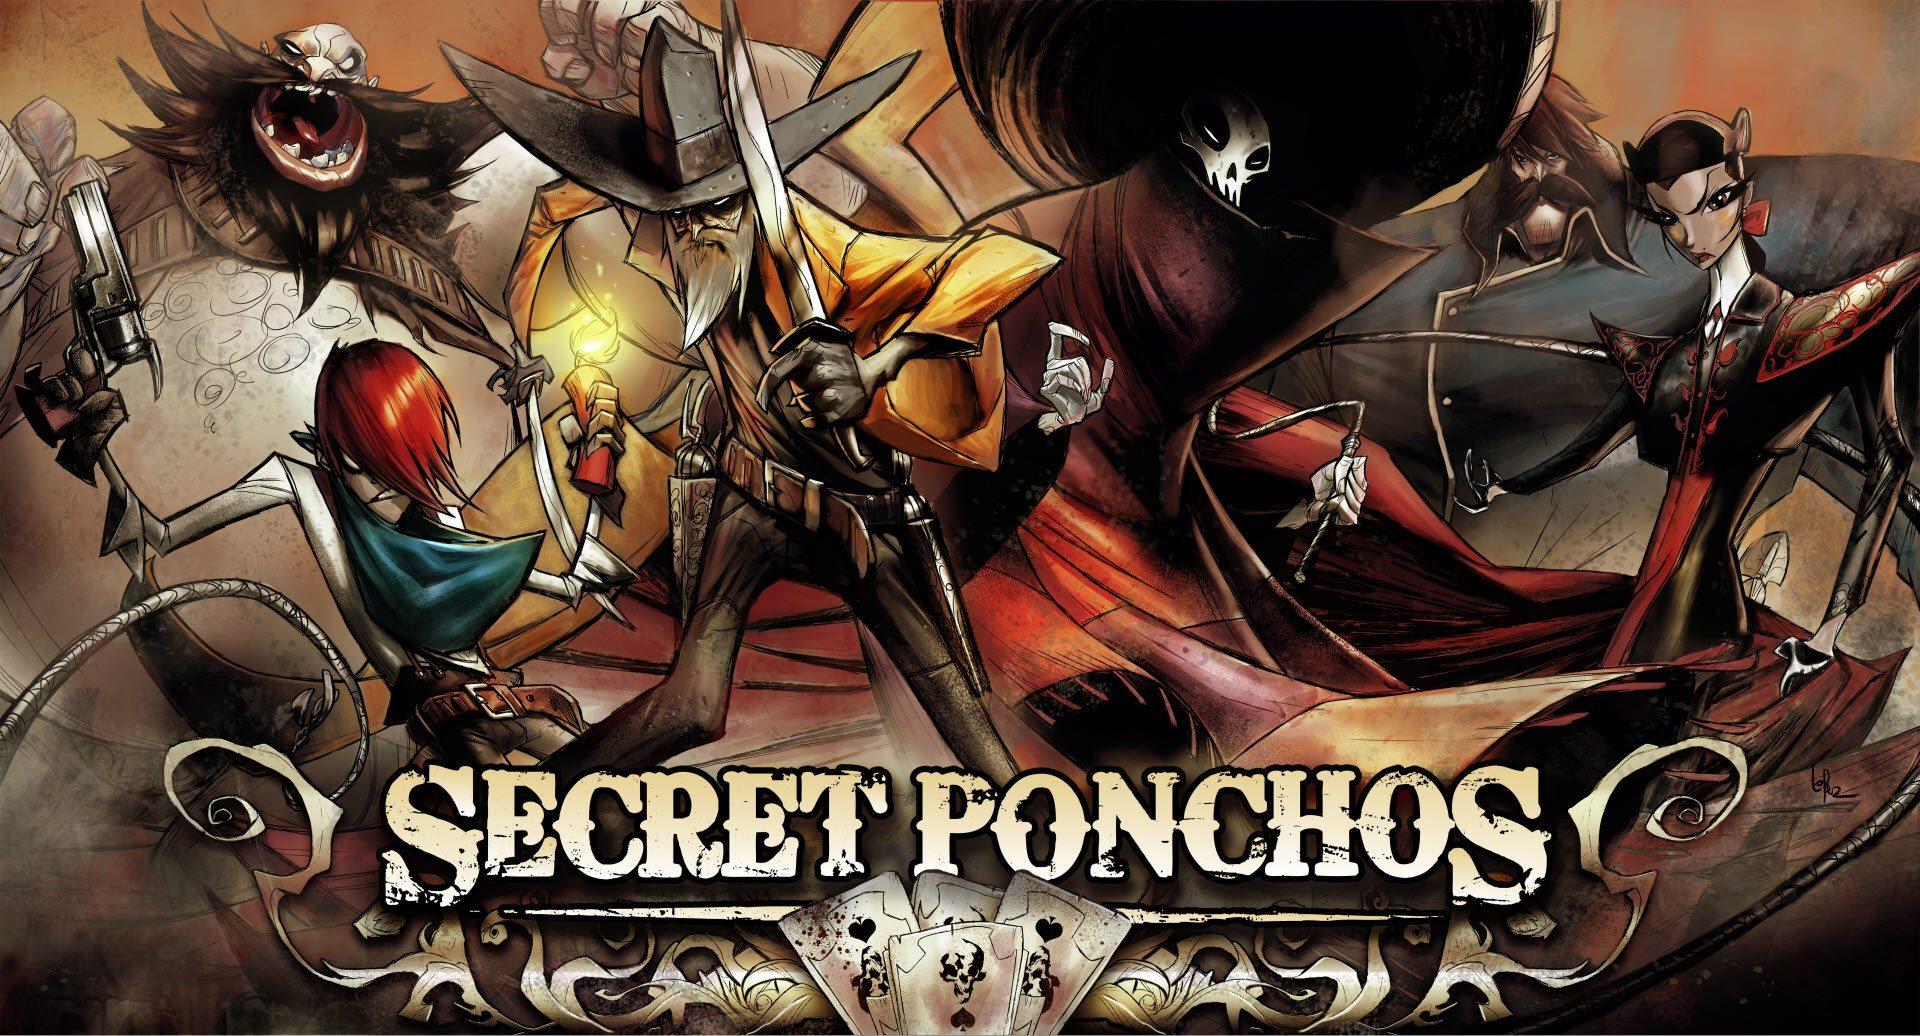 SecretPonchos_Outlaws_bagogames